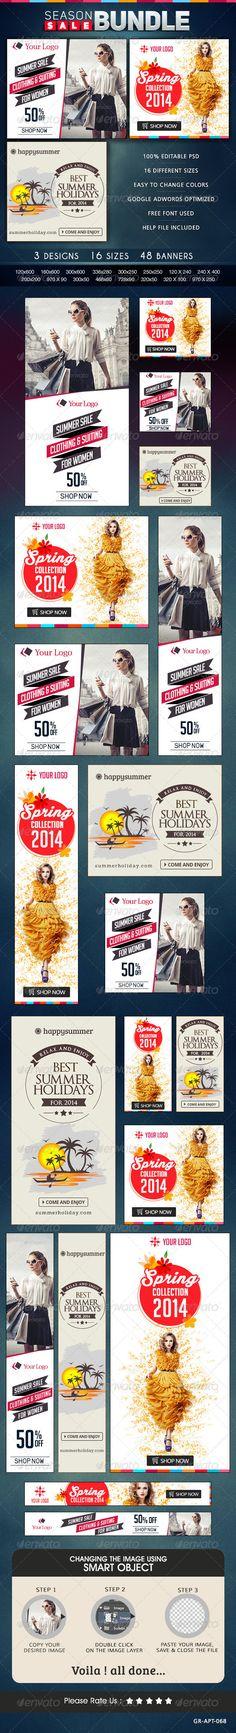 Season Sale Banner Bundle - 3 Sets Template PSD | Buy and Download: http://graphicriver.net/item/season-sale-banner-bundle-3-sets/8567326?WT.ac=category_thumb&WT.z_author=doto&ref=ksioks